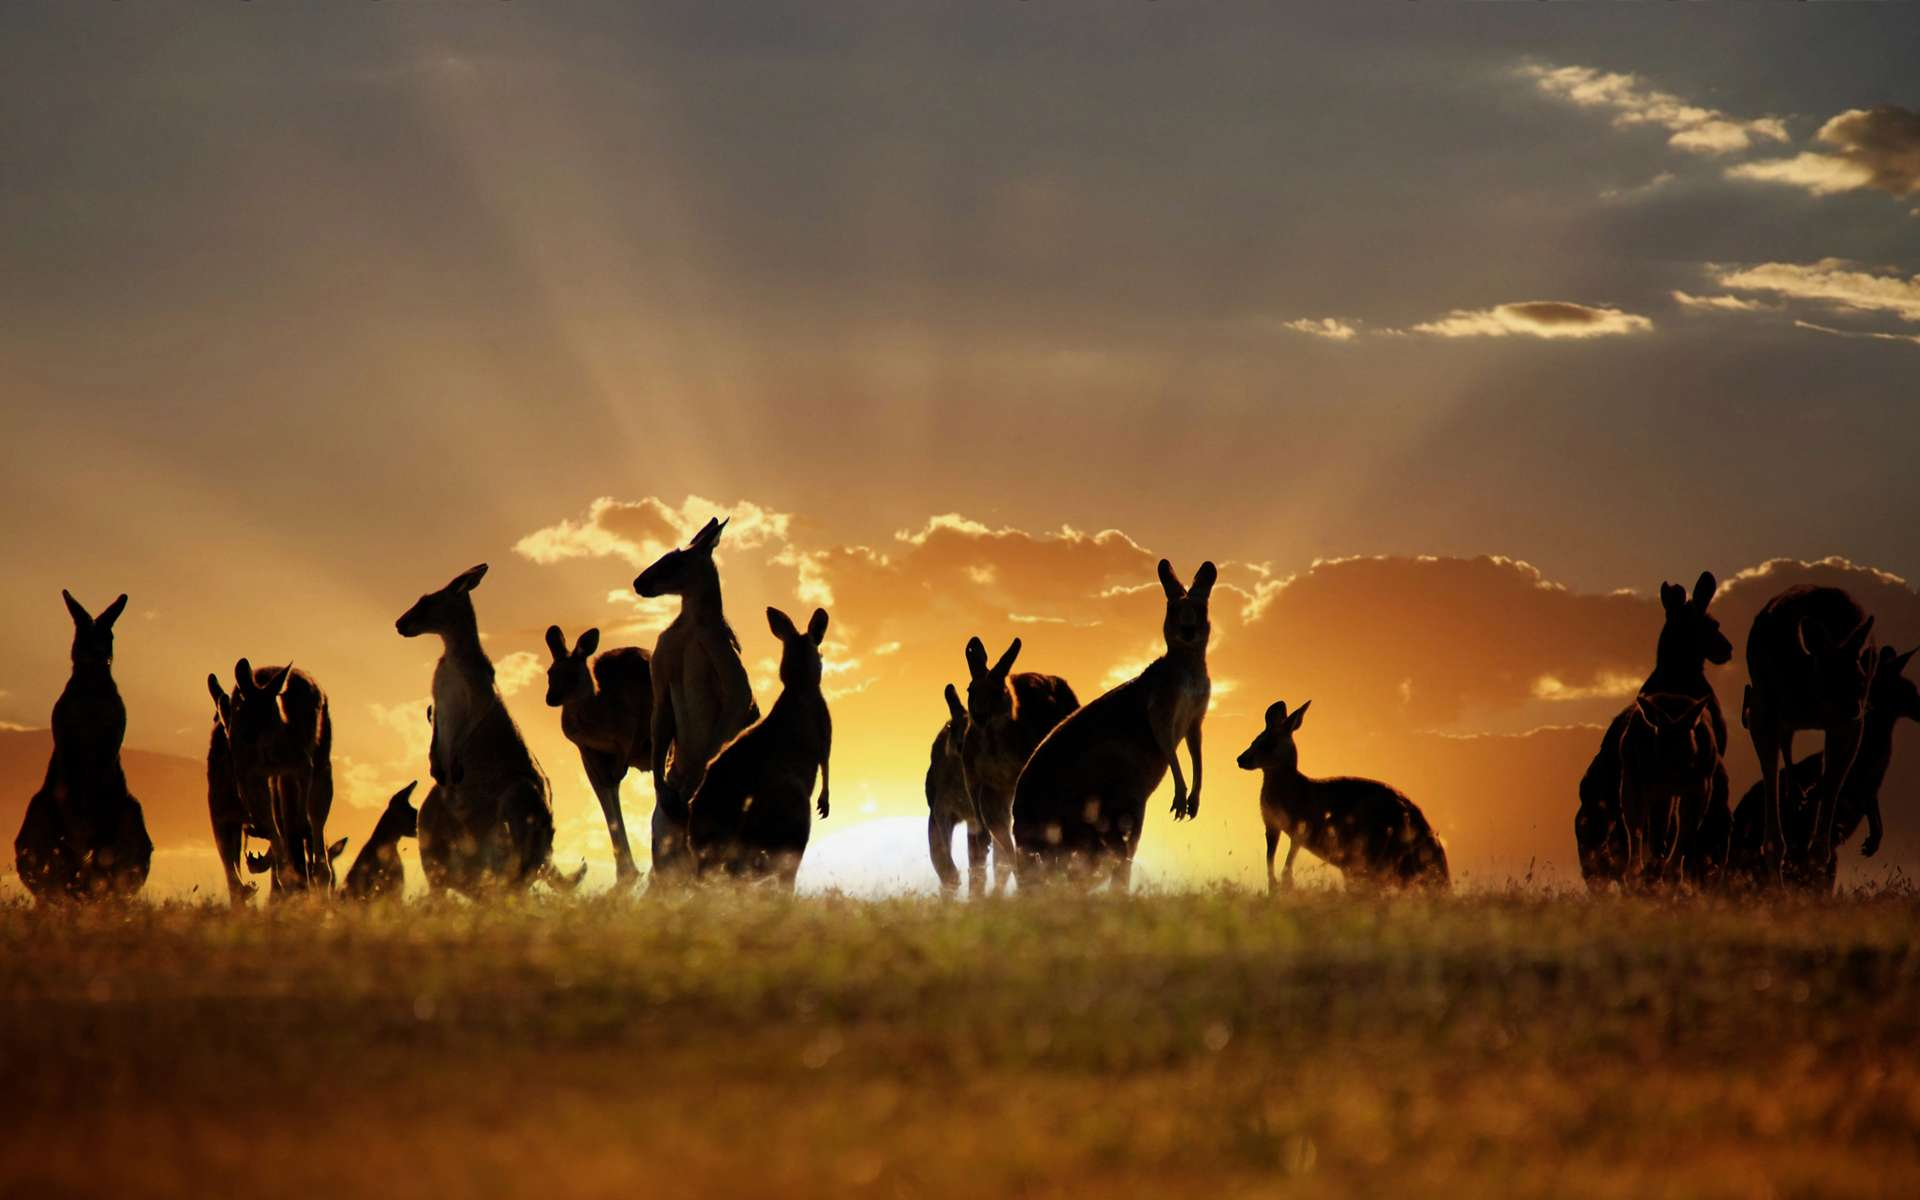 Download Kangaroo Wallpaper 8977 1920x1200 px High Resolution ...